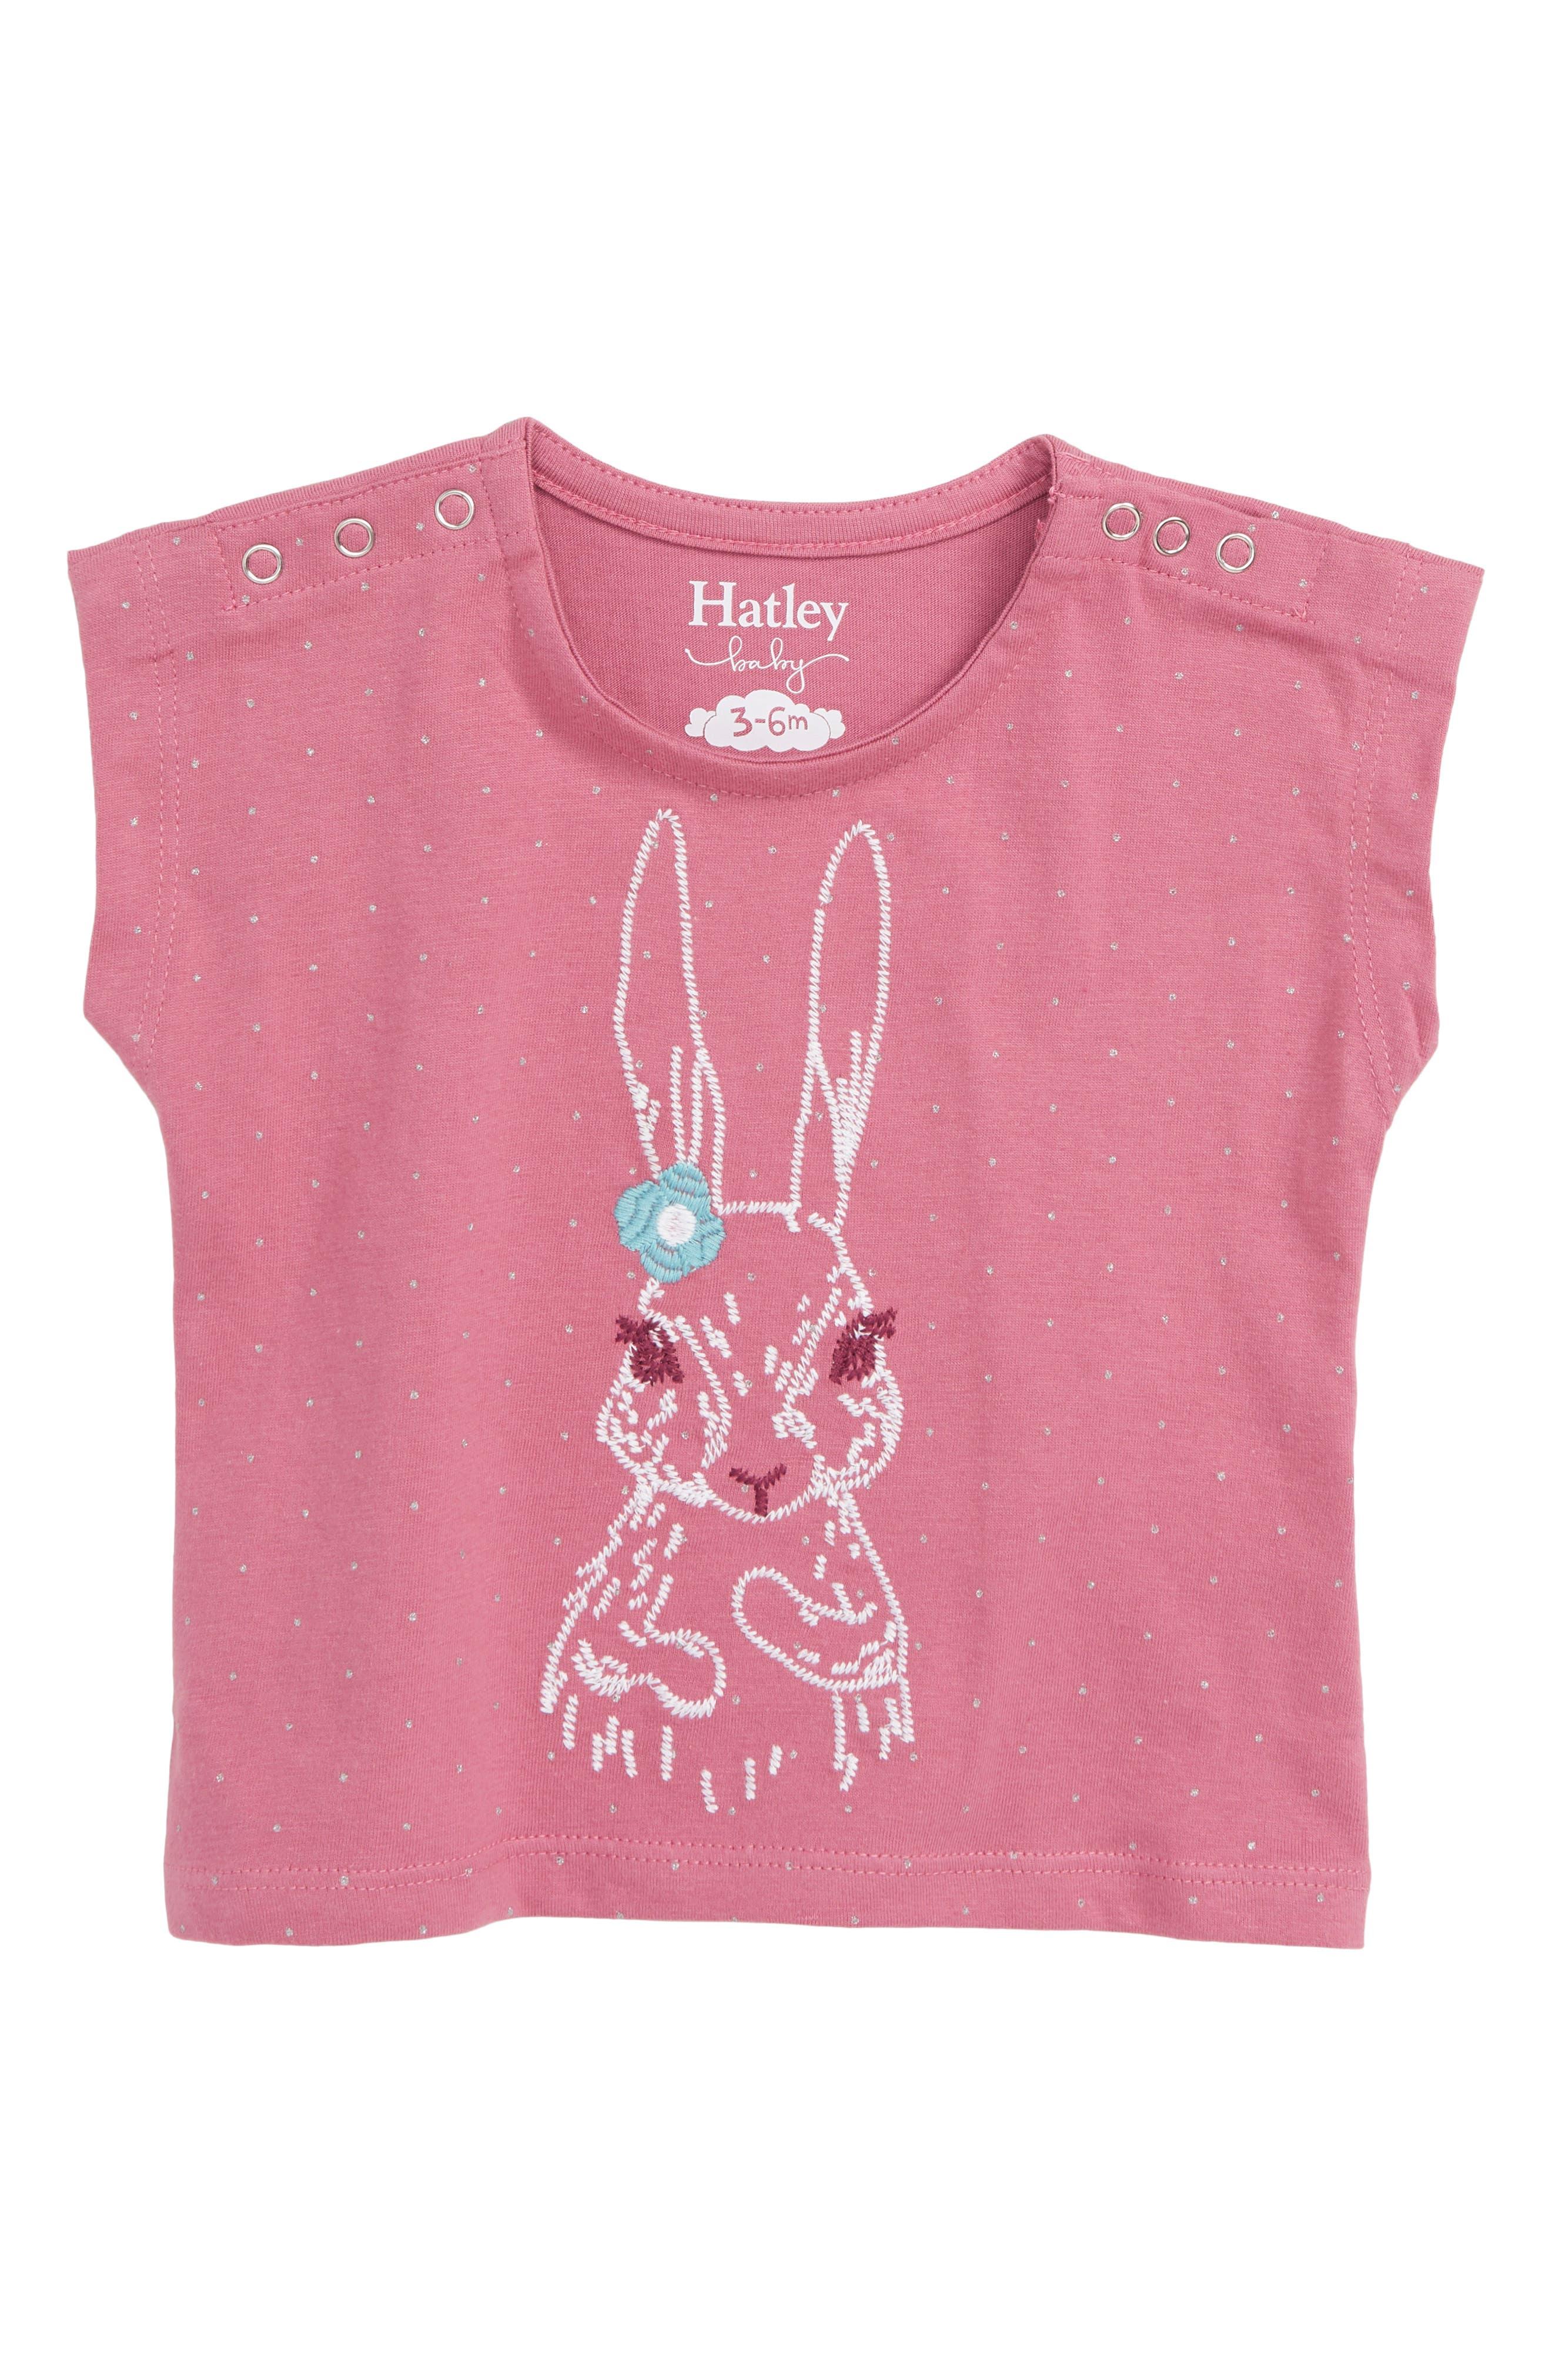 HATLEY Pretty Bunny Organic Cotton T-Shirt, Main, color, 650